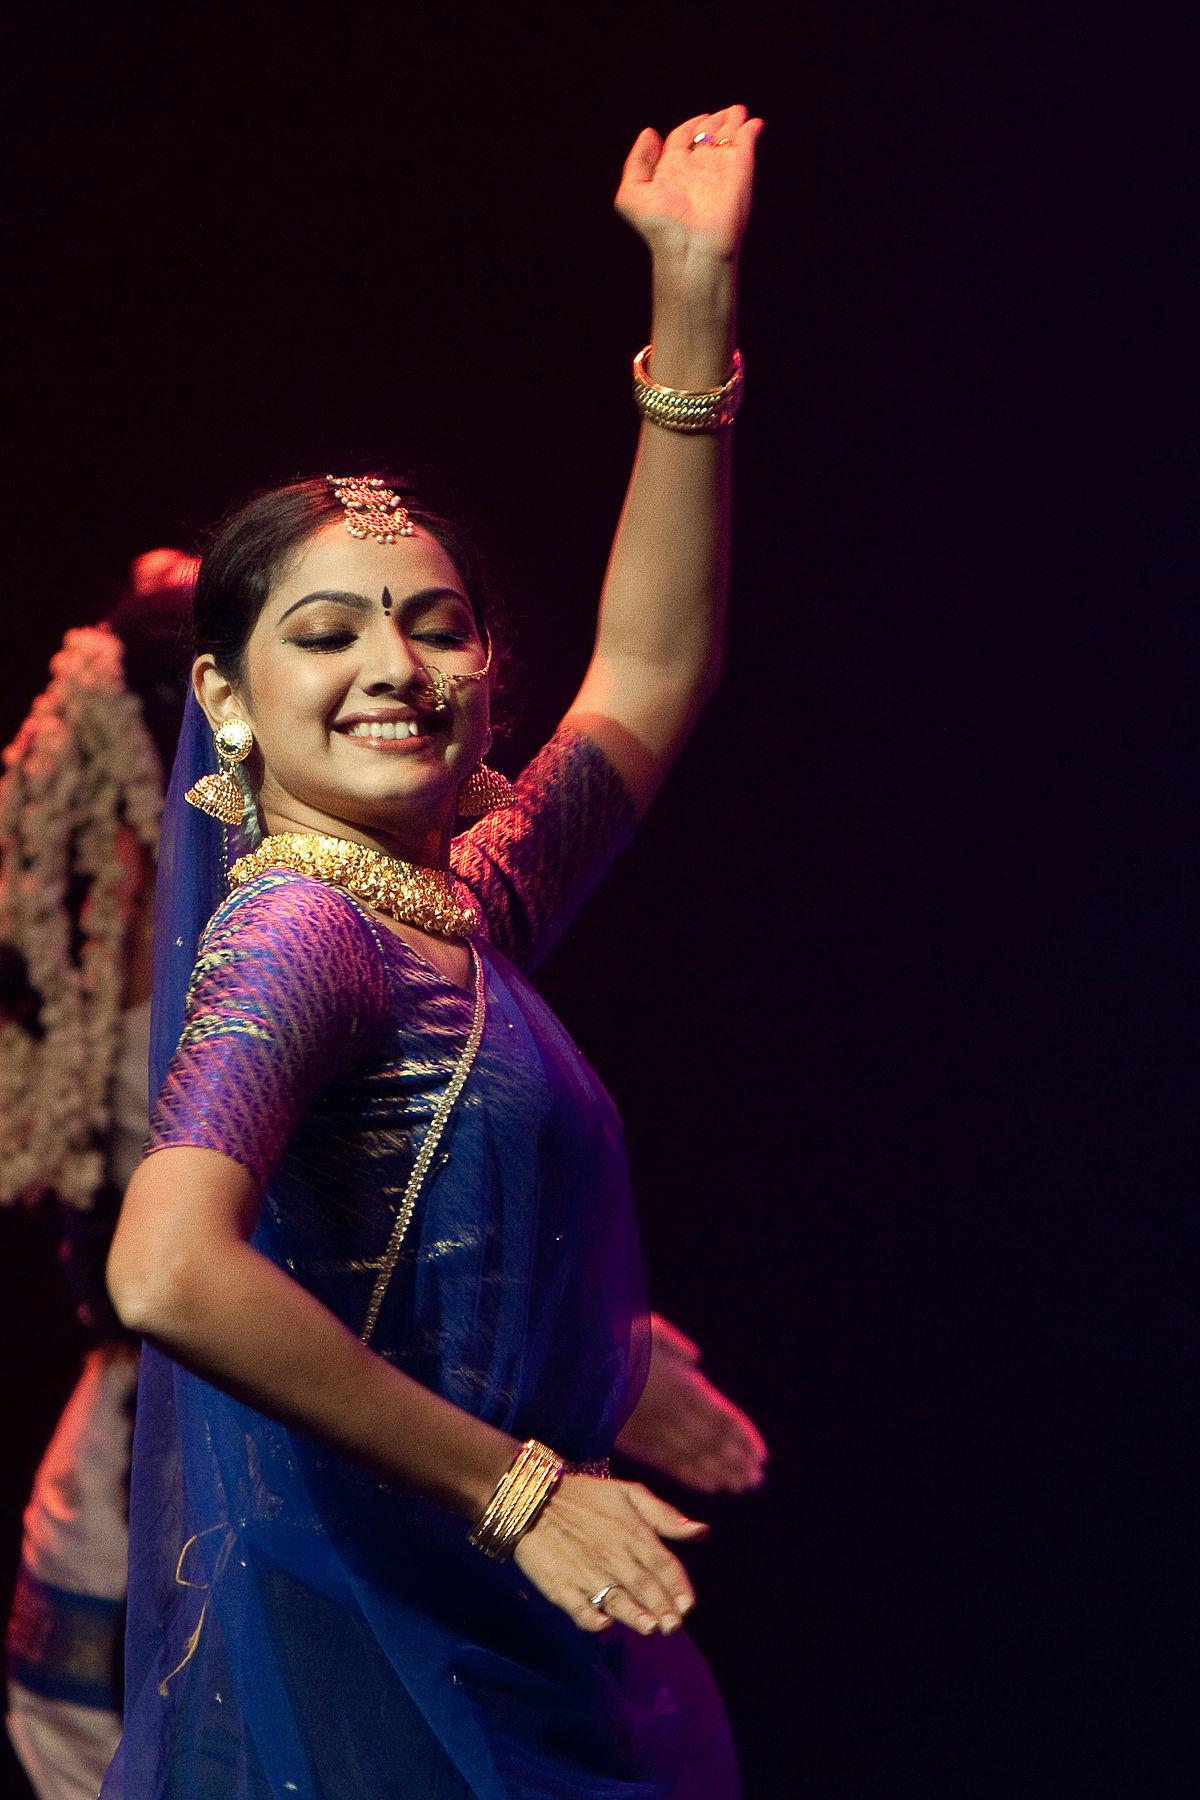 Samvrutha Sunil - Wikidata